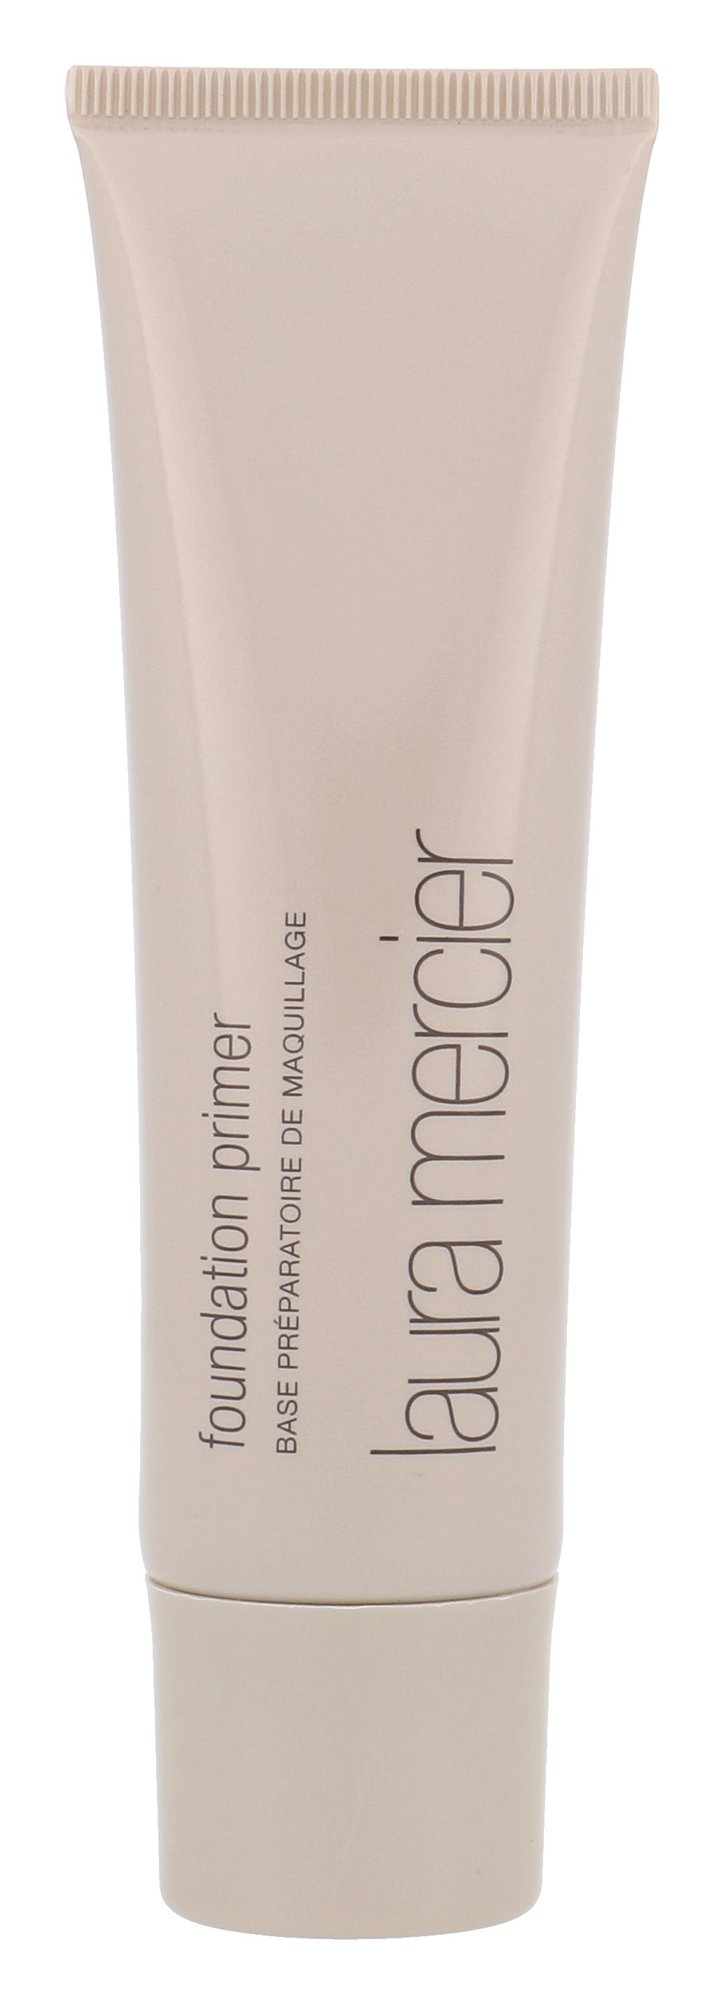 Laura Mercier Foundation Primer Cosmetic 50ml